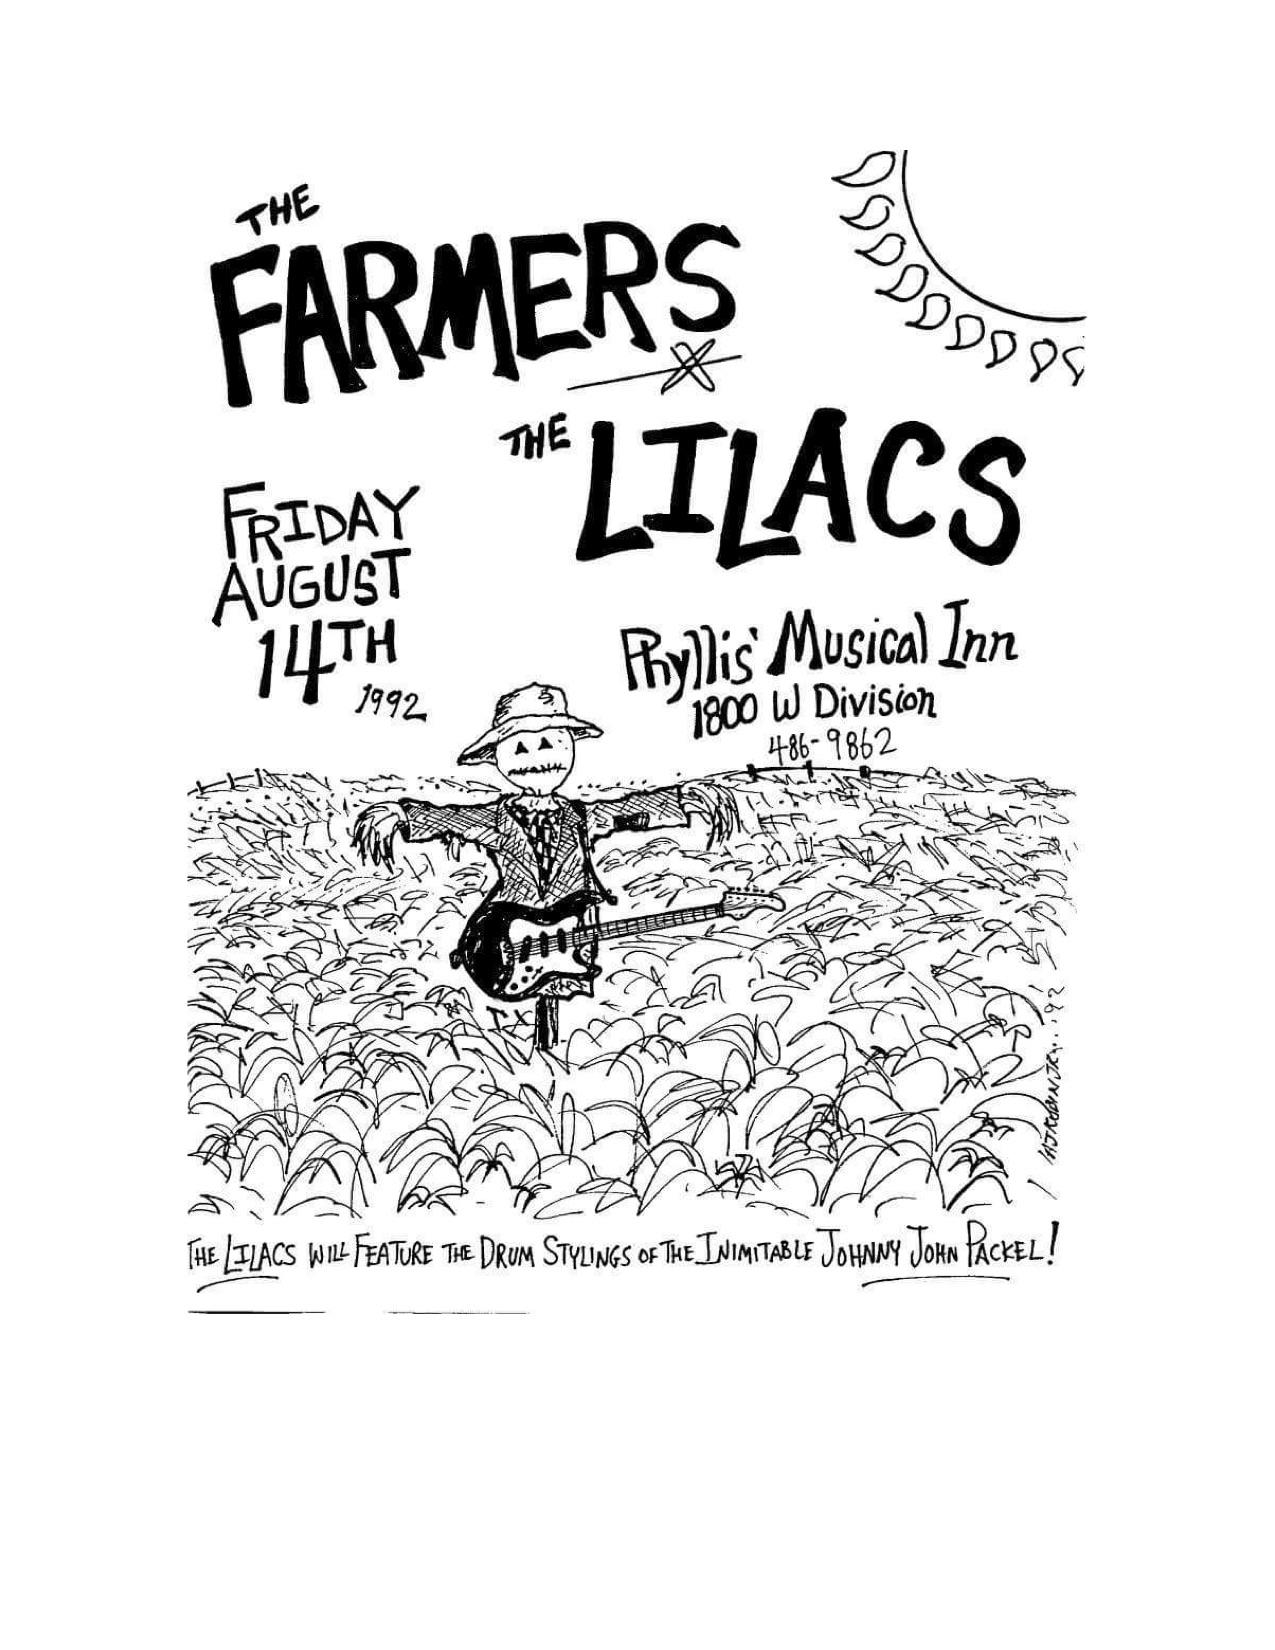 The Lilacs Poster 20 (Farmers PMI).jpg